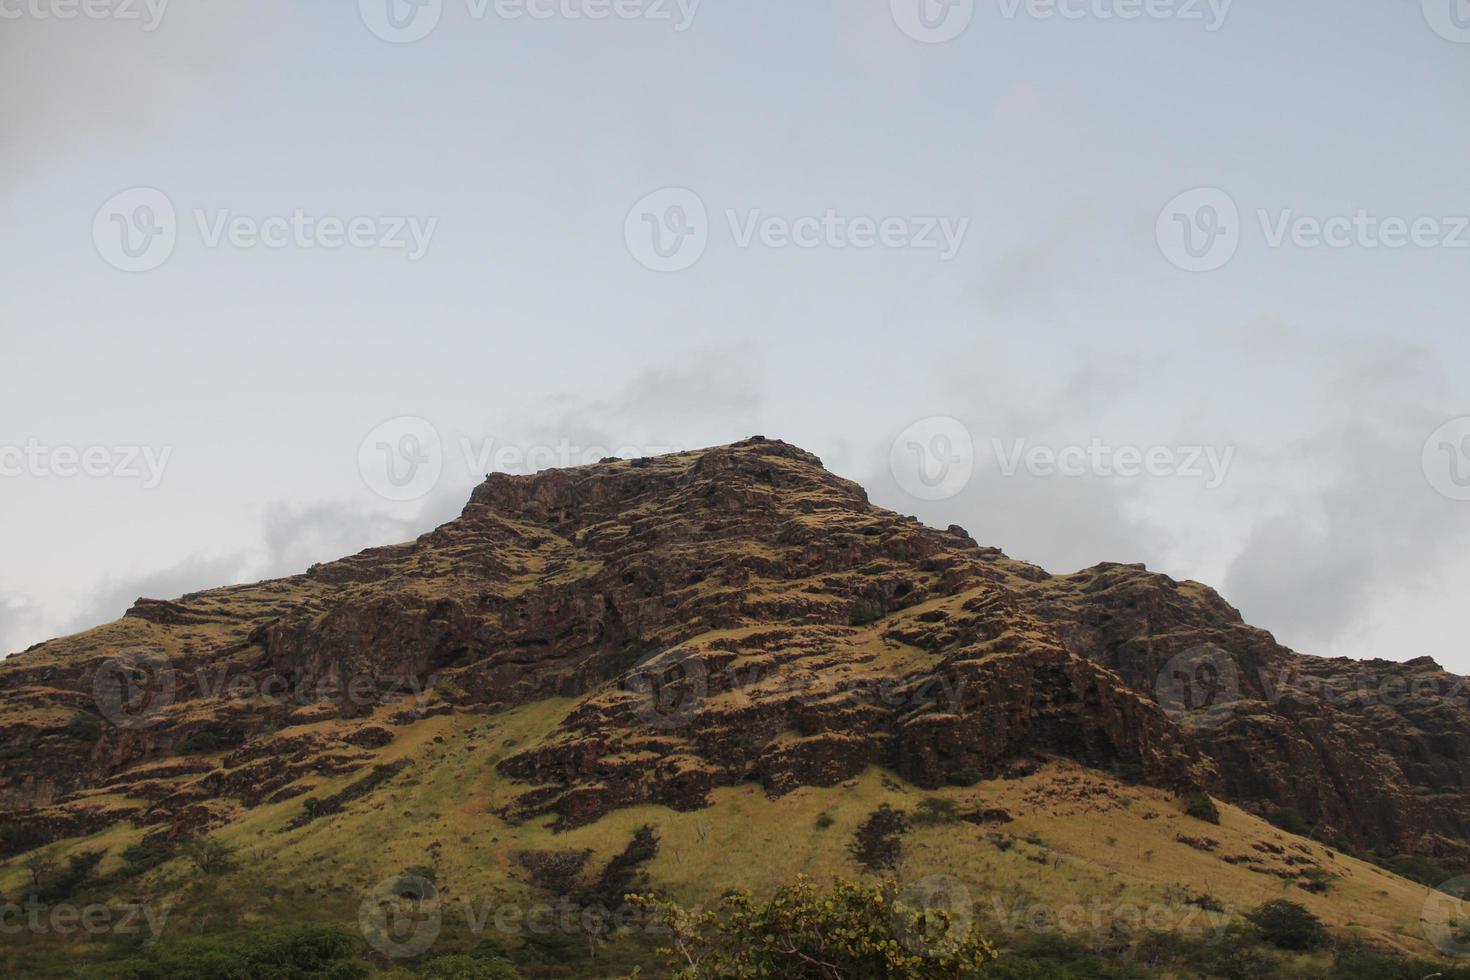 oahu montagne verdi foto